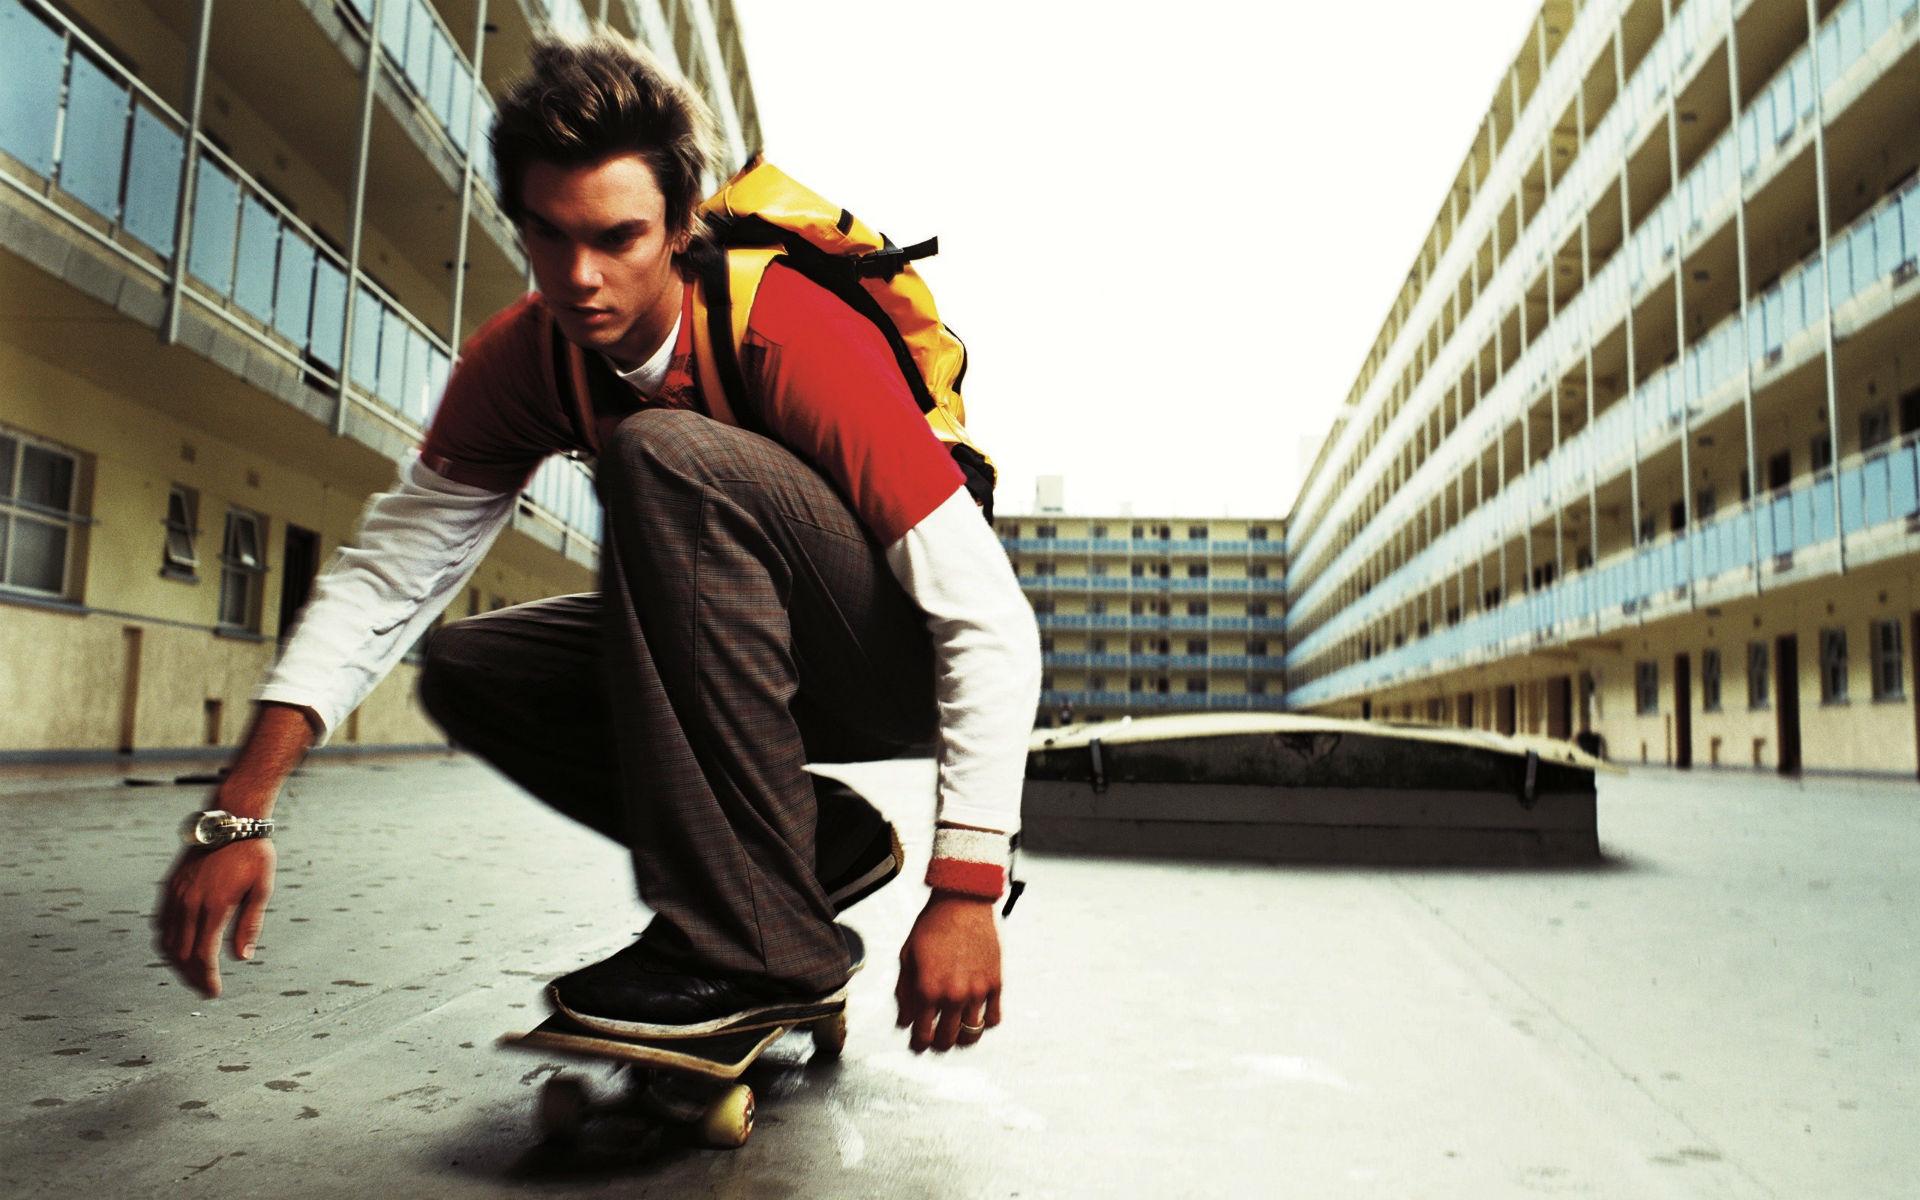 3d Wallpaper Cowboys Hd Skateboarding Backgrounds Pixelstalk Net